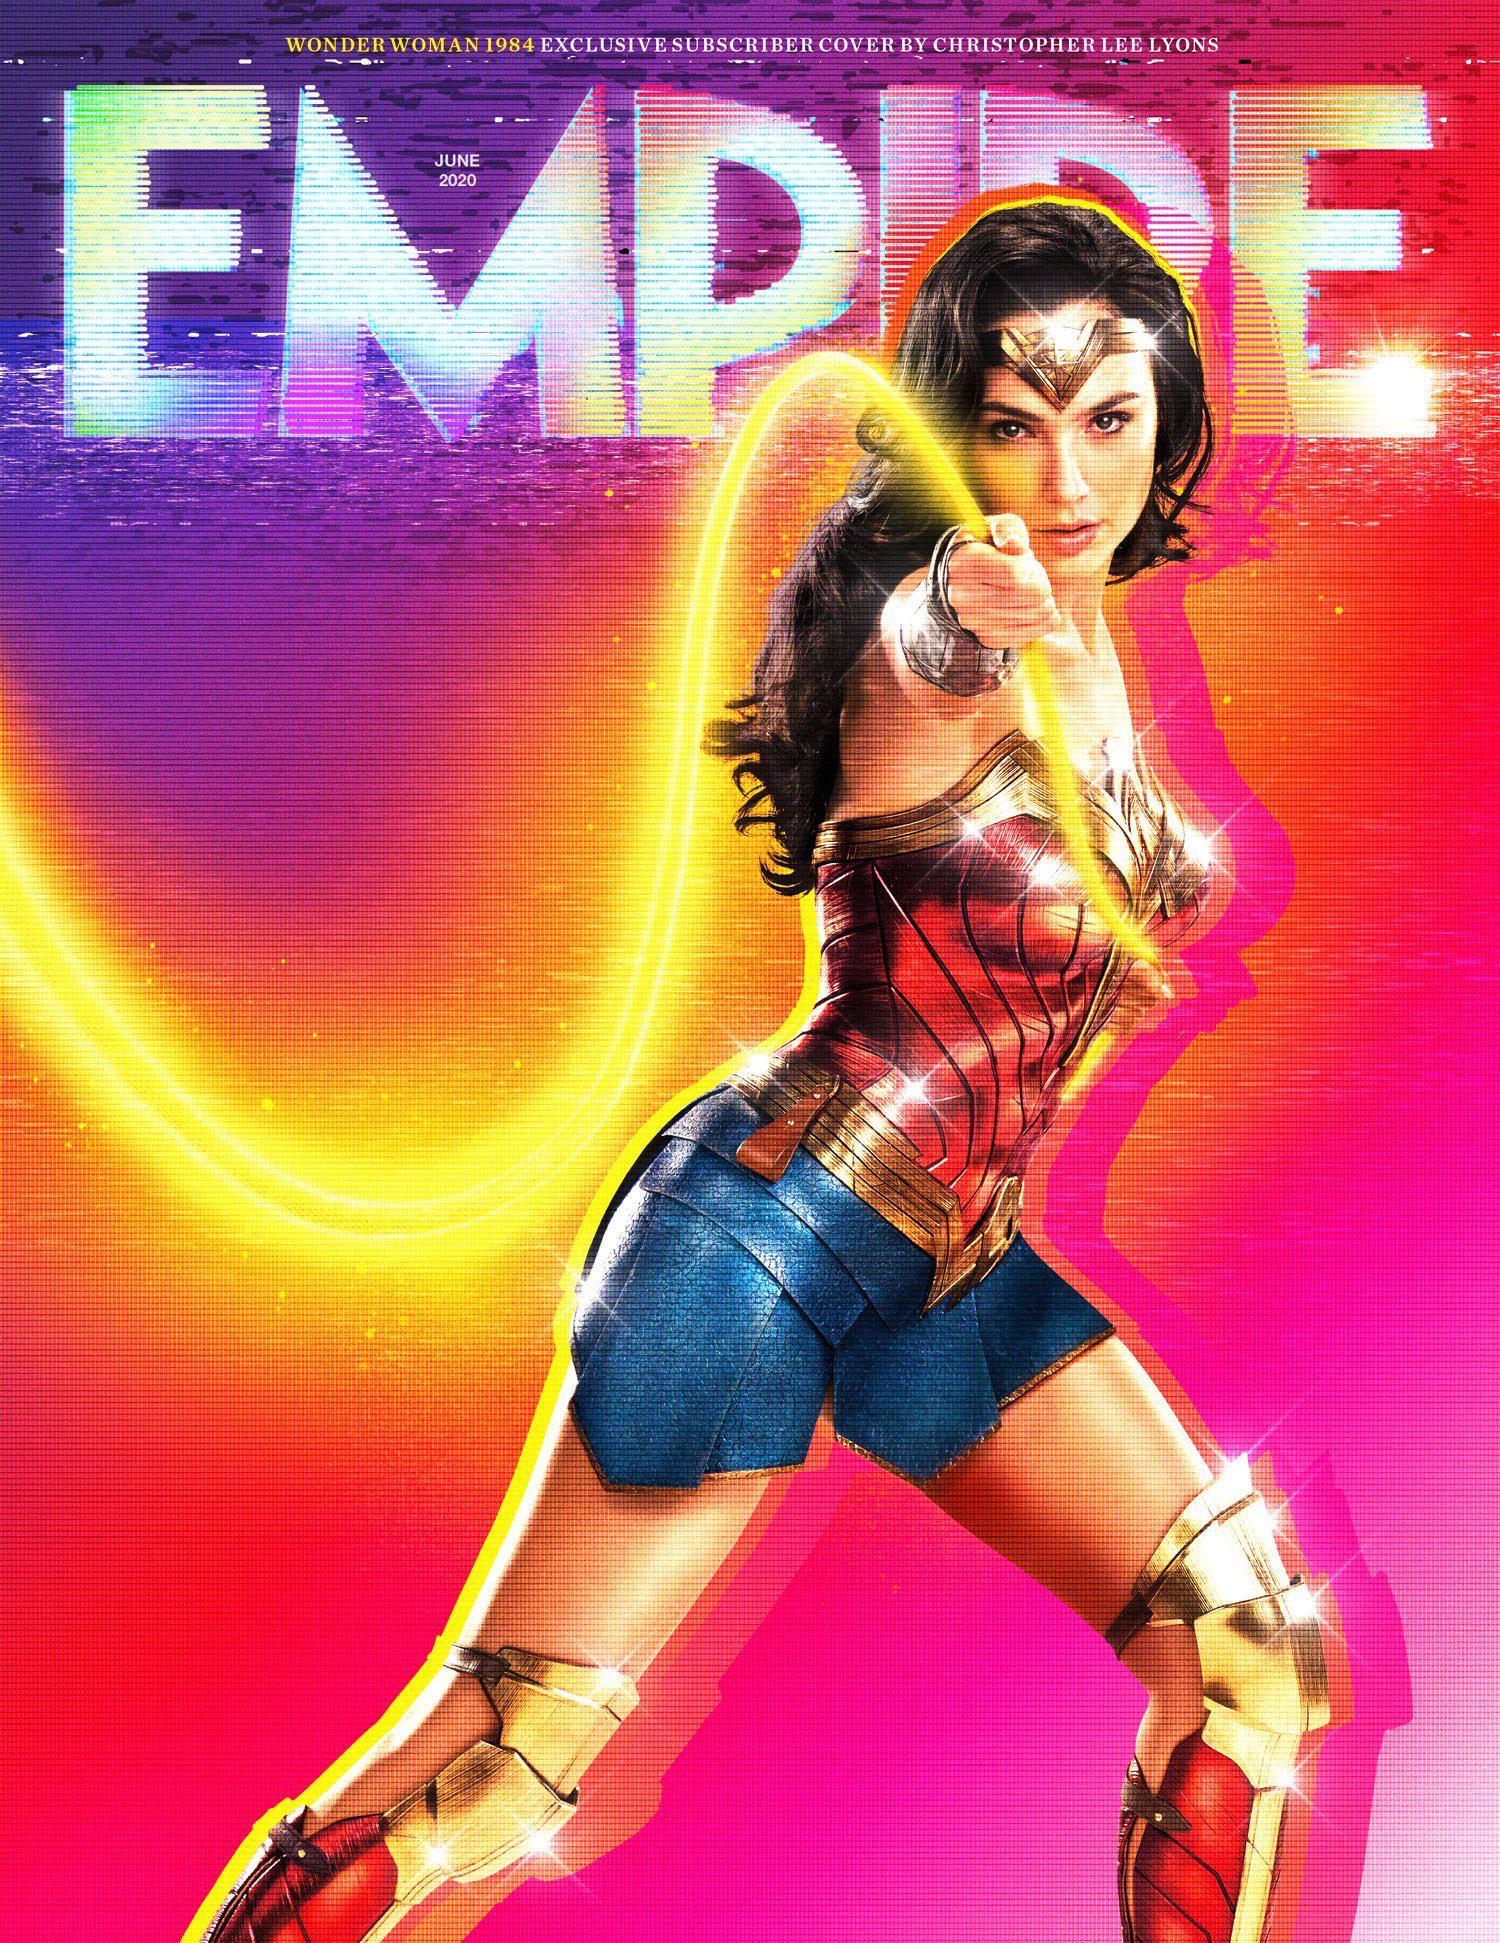 Wonder Woman 1984 Empire Magazine Cover